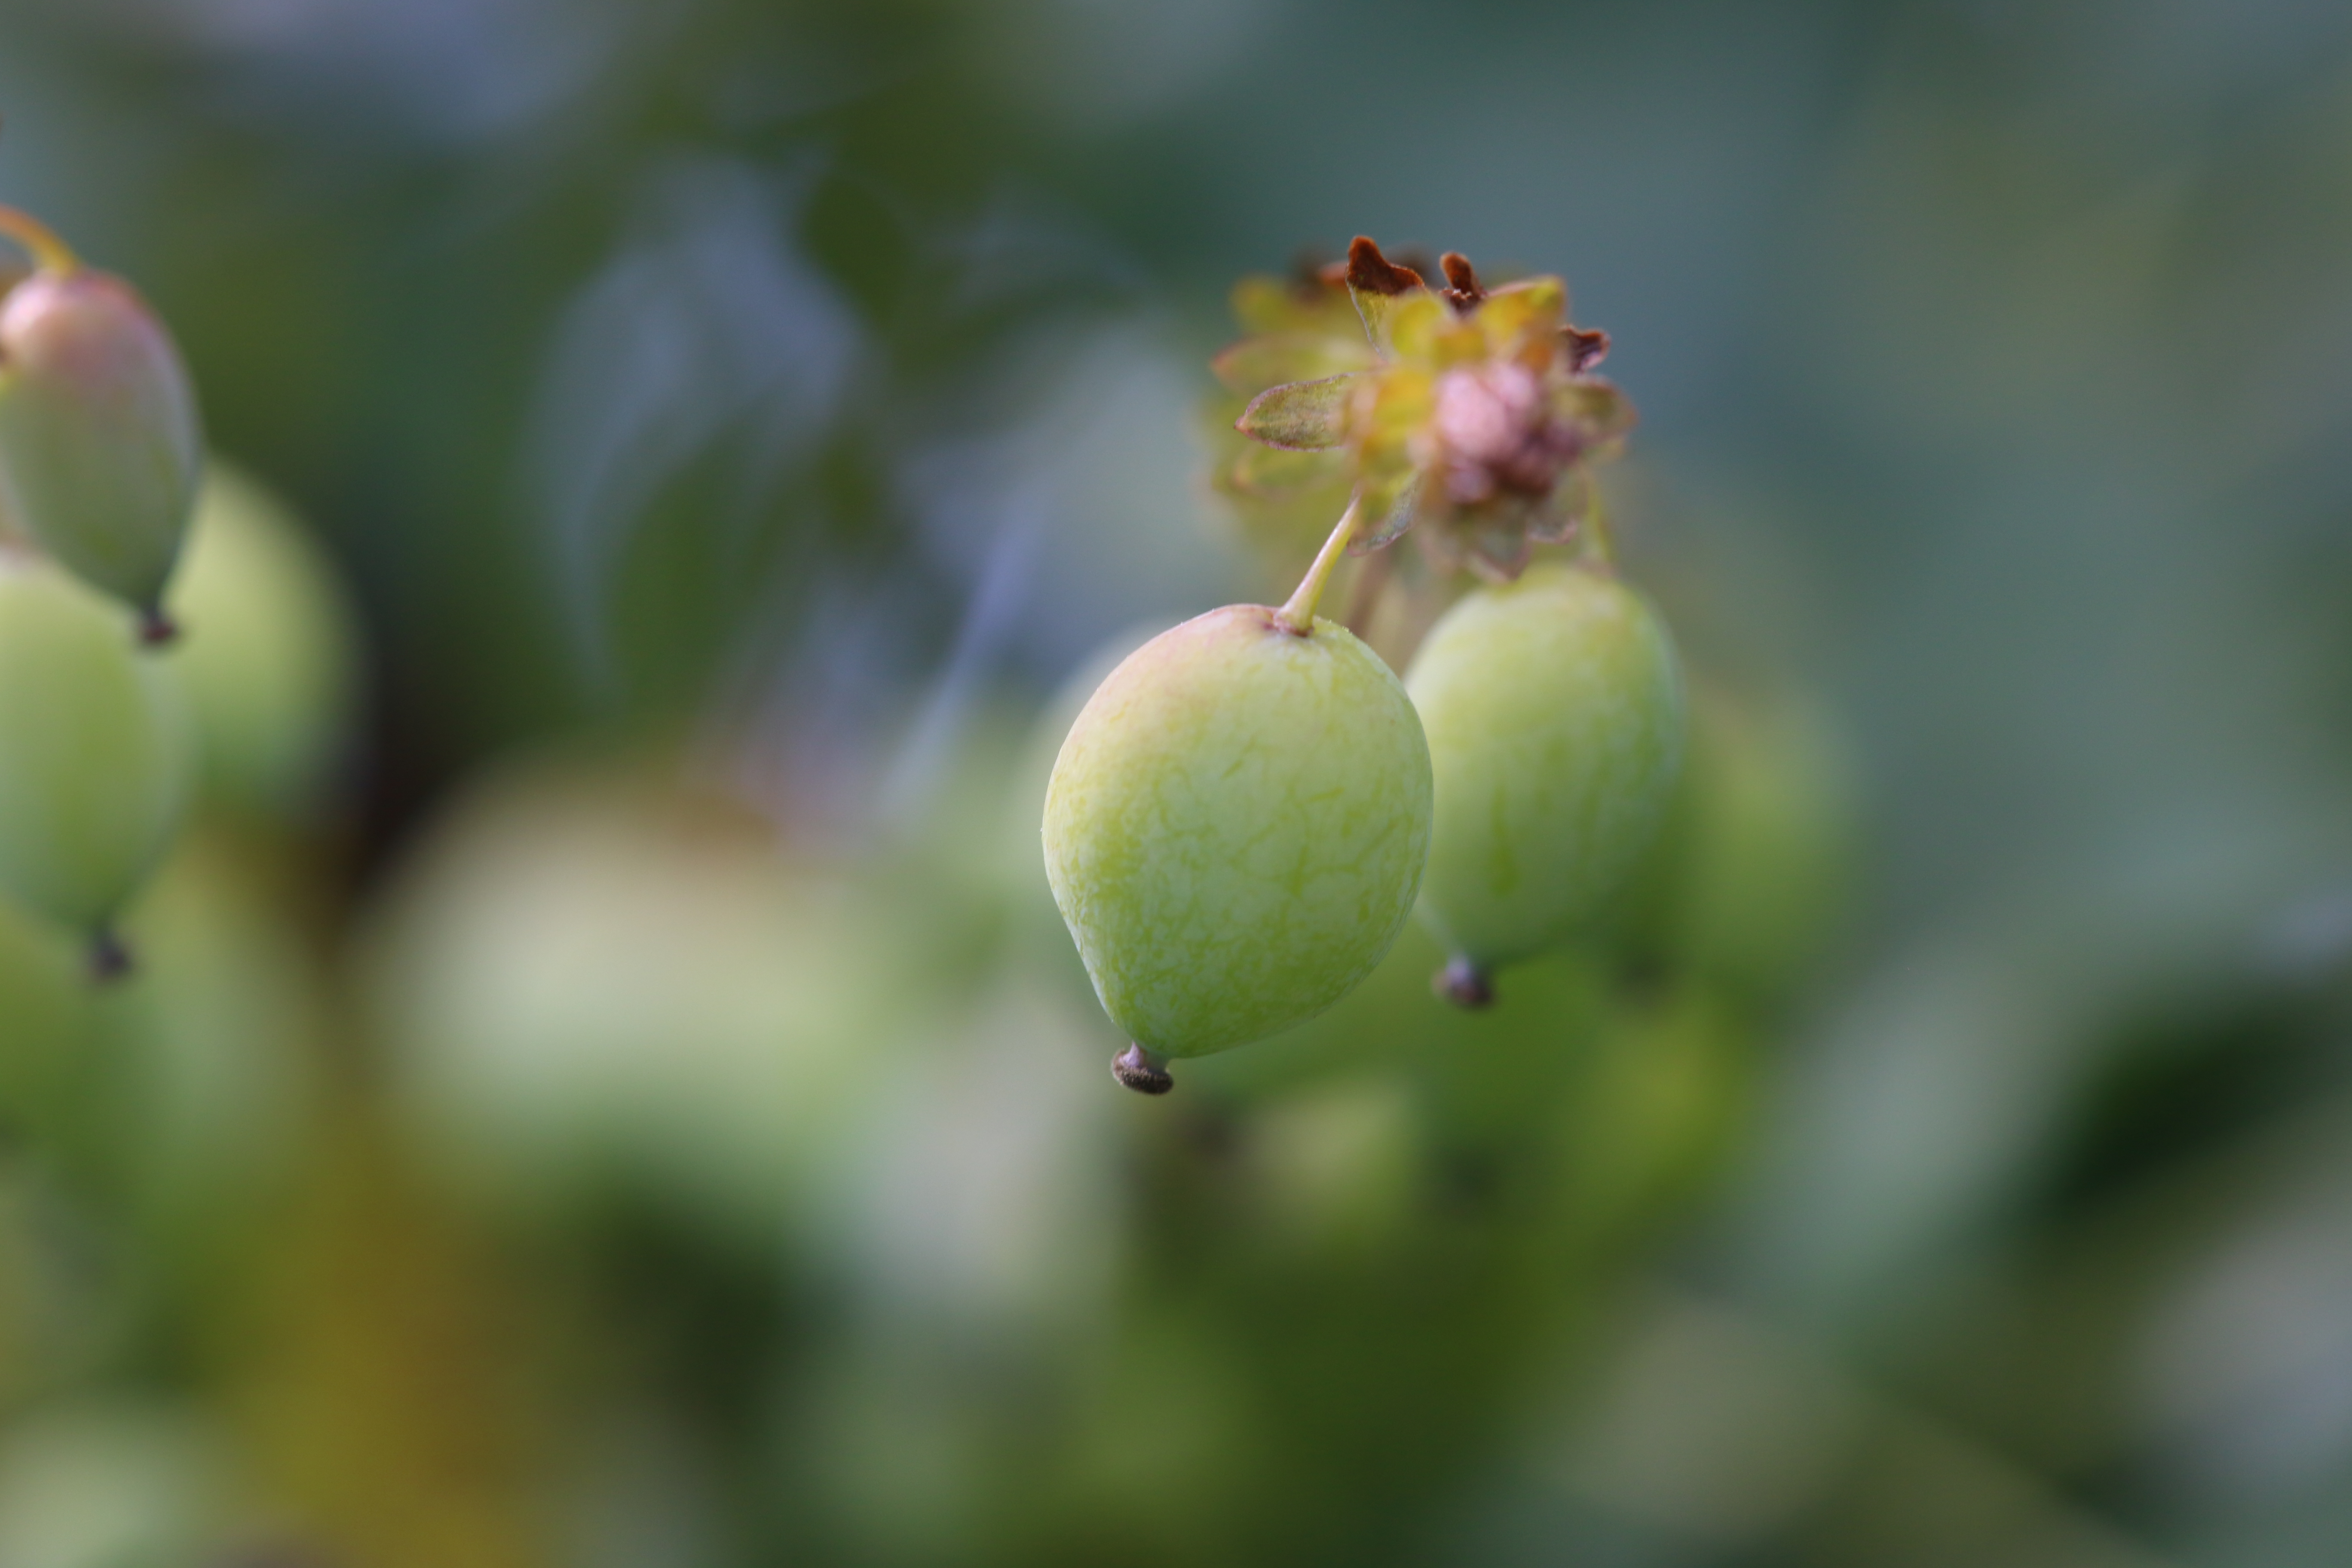 young vine buds still green